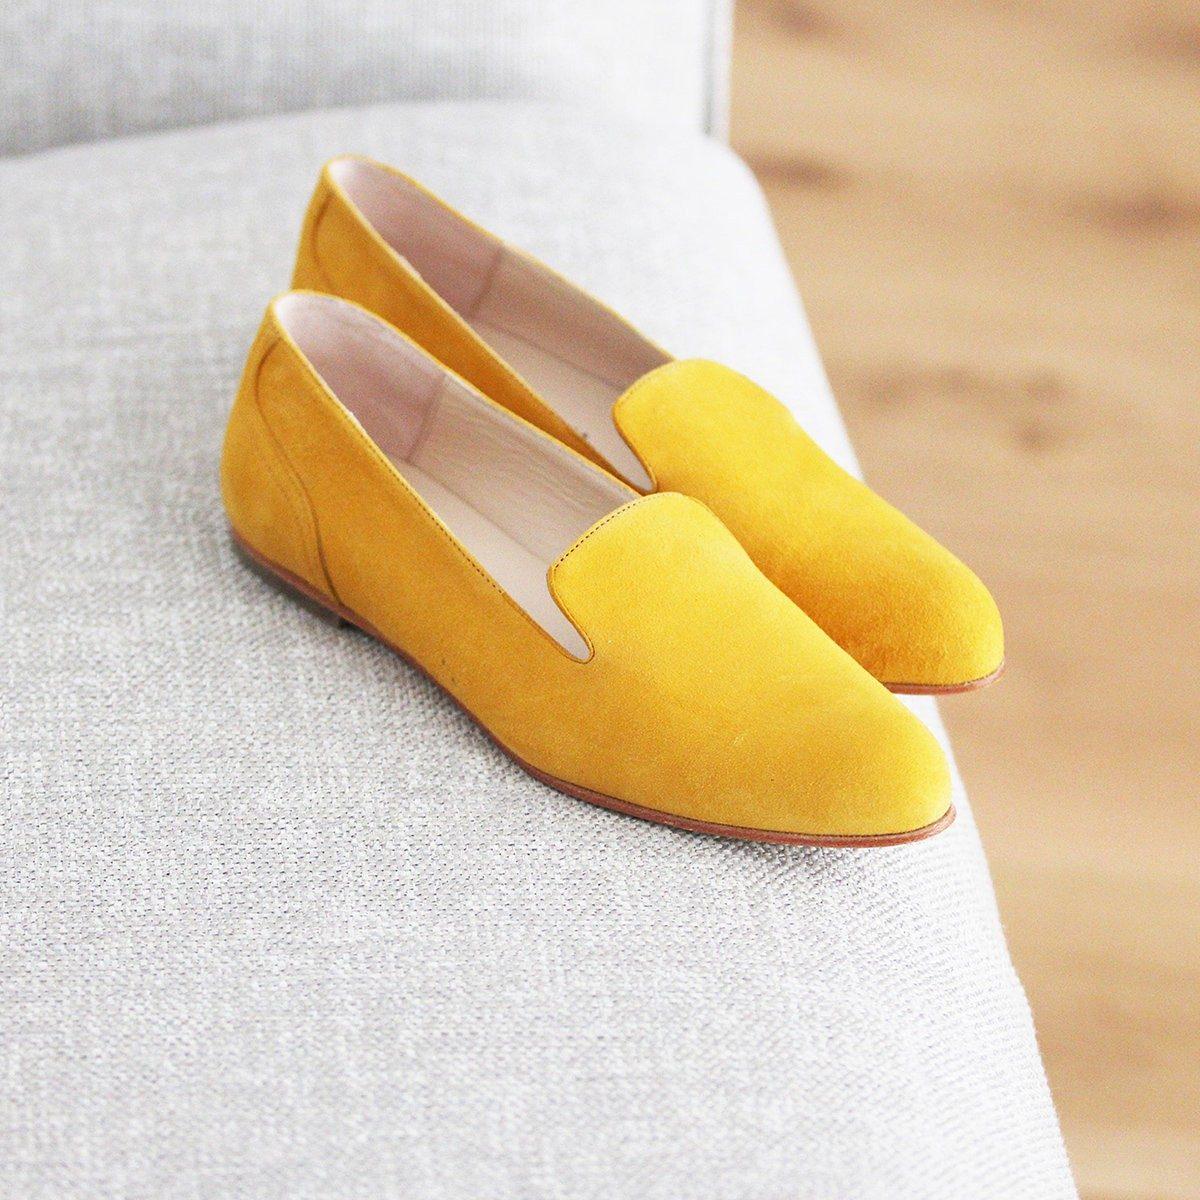 JULES & JENN - slippers - classiques - cuir - daim - jaune - moutarde